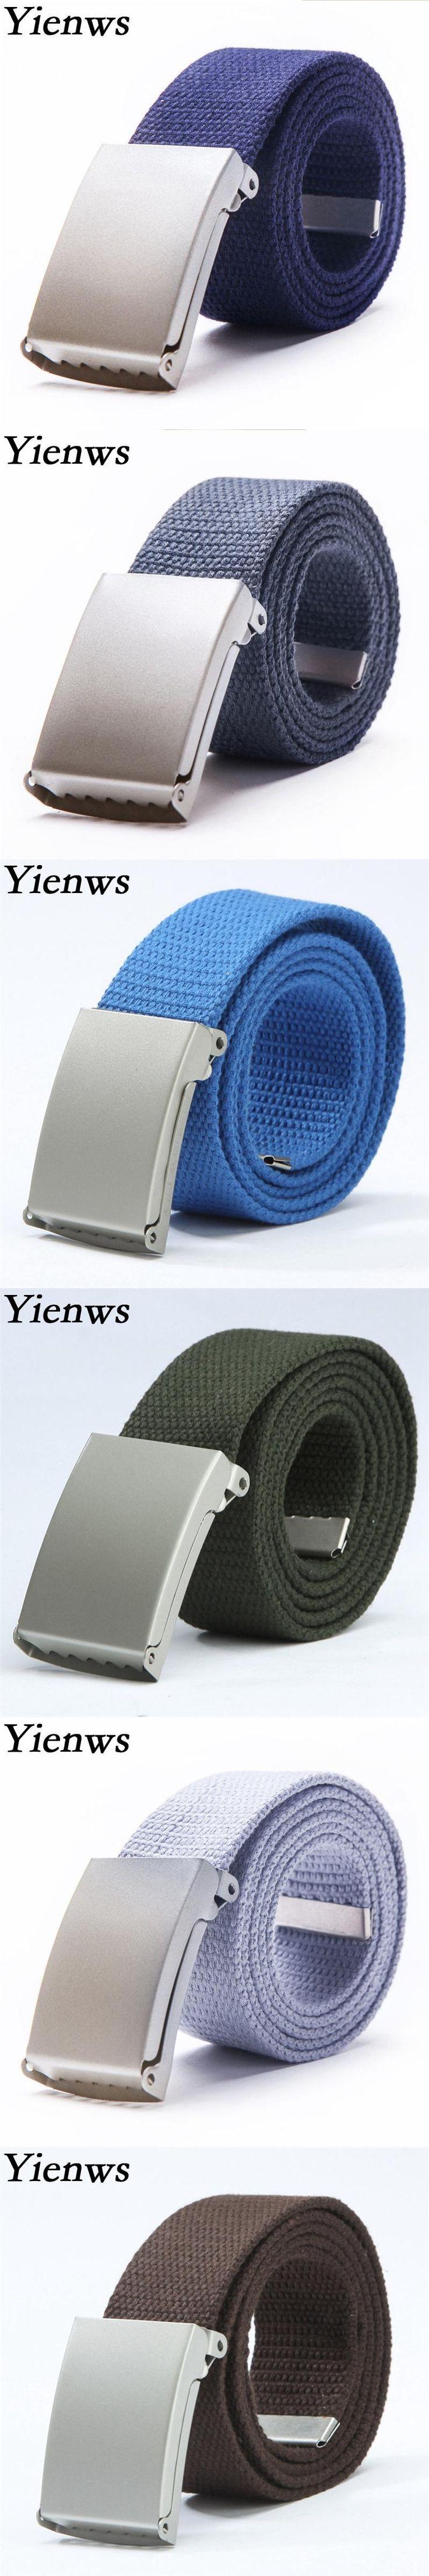 Yienws Black Pink Boy Girl Belt Strap Children's Belts Western Cowboy Belt Kemer For Jeans Outdoor YB004